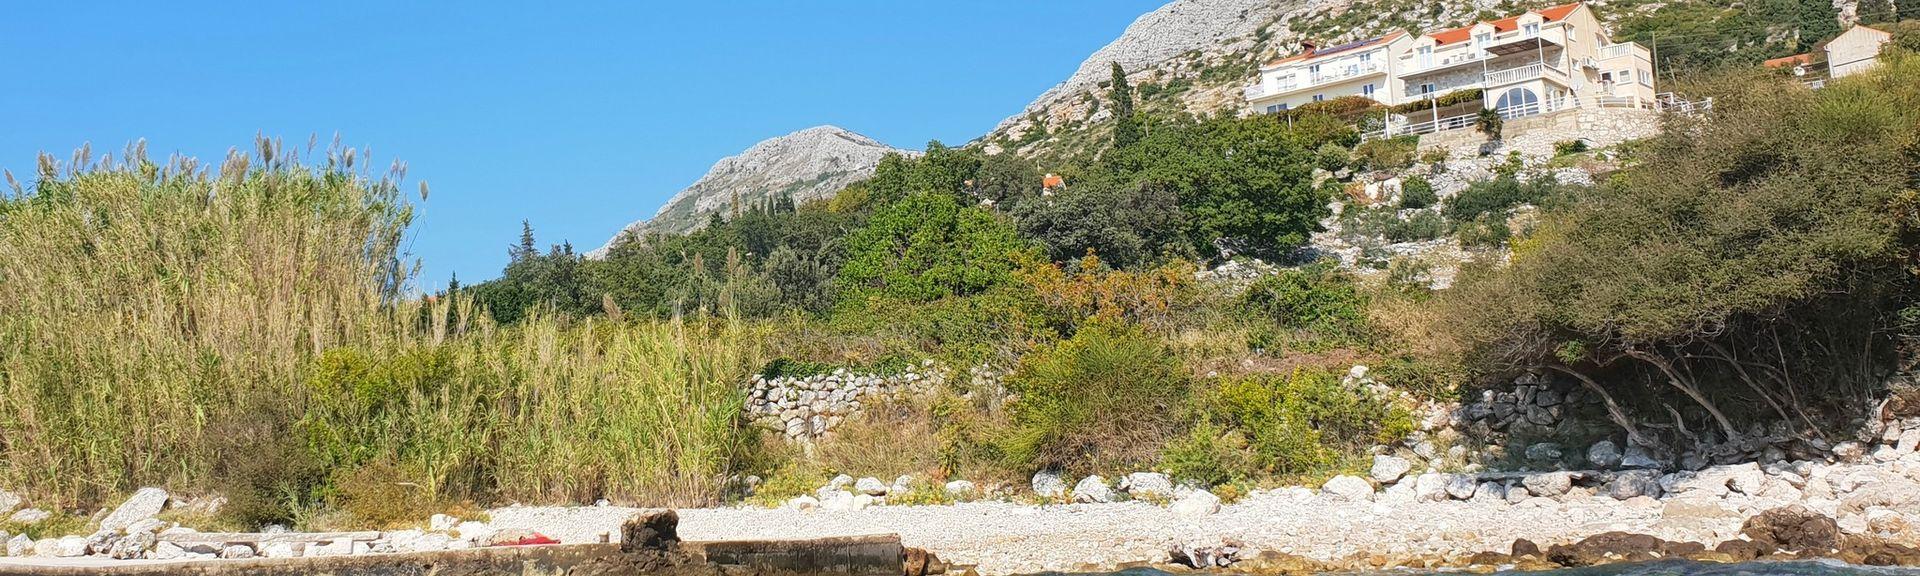 Ploce, Comitat de Dubrovnik-Neretva, Croatie